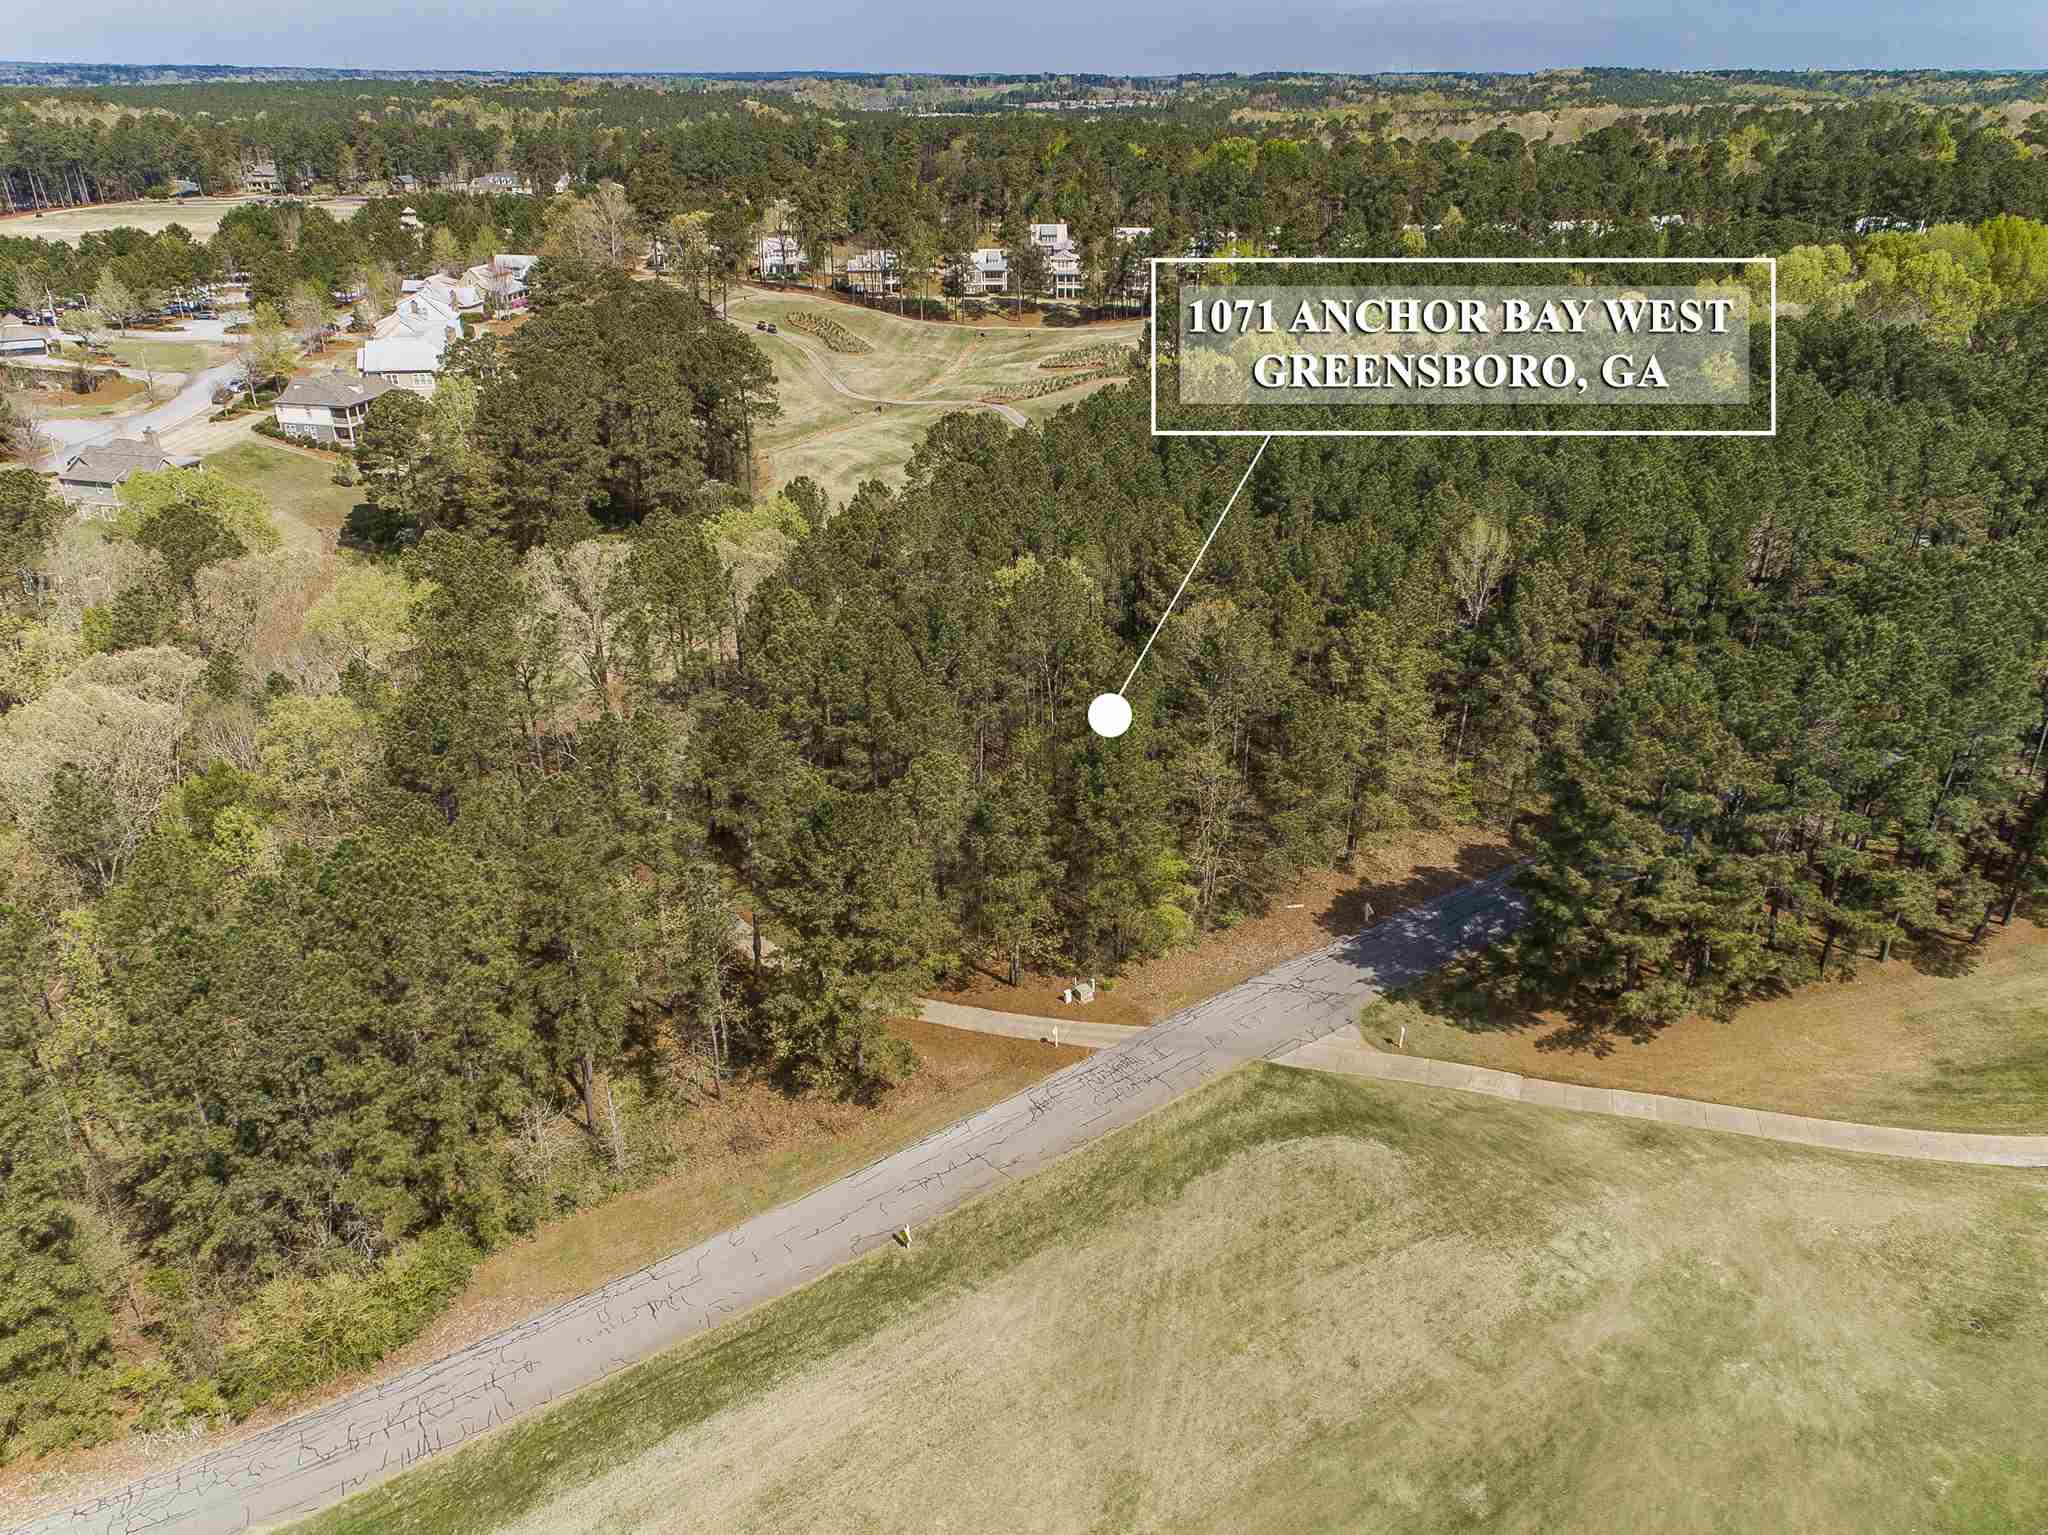 1071 ANCHOR BAY WEST AS, Lake Oconee Reynolds Landing in Greene County, GA 30642 Home for Sale